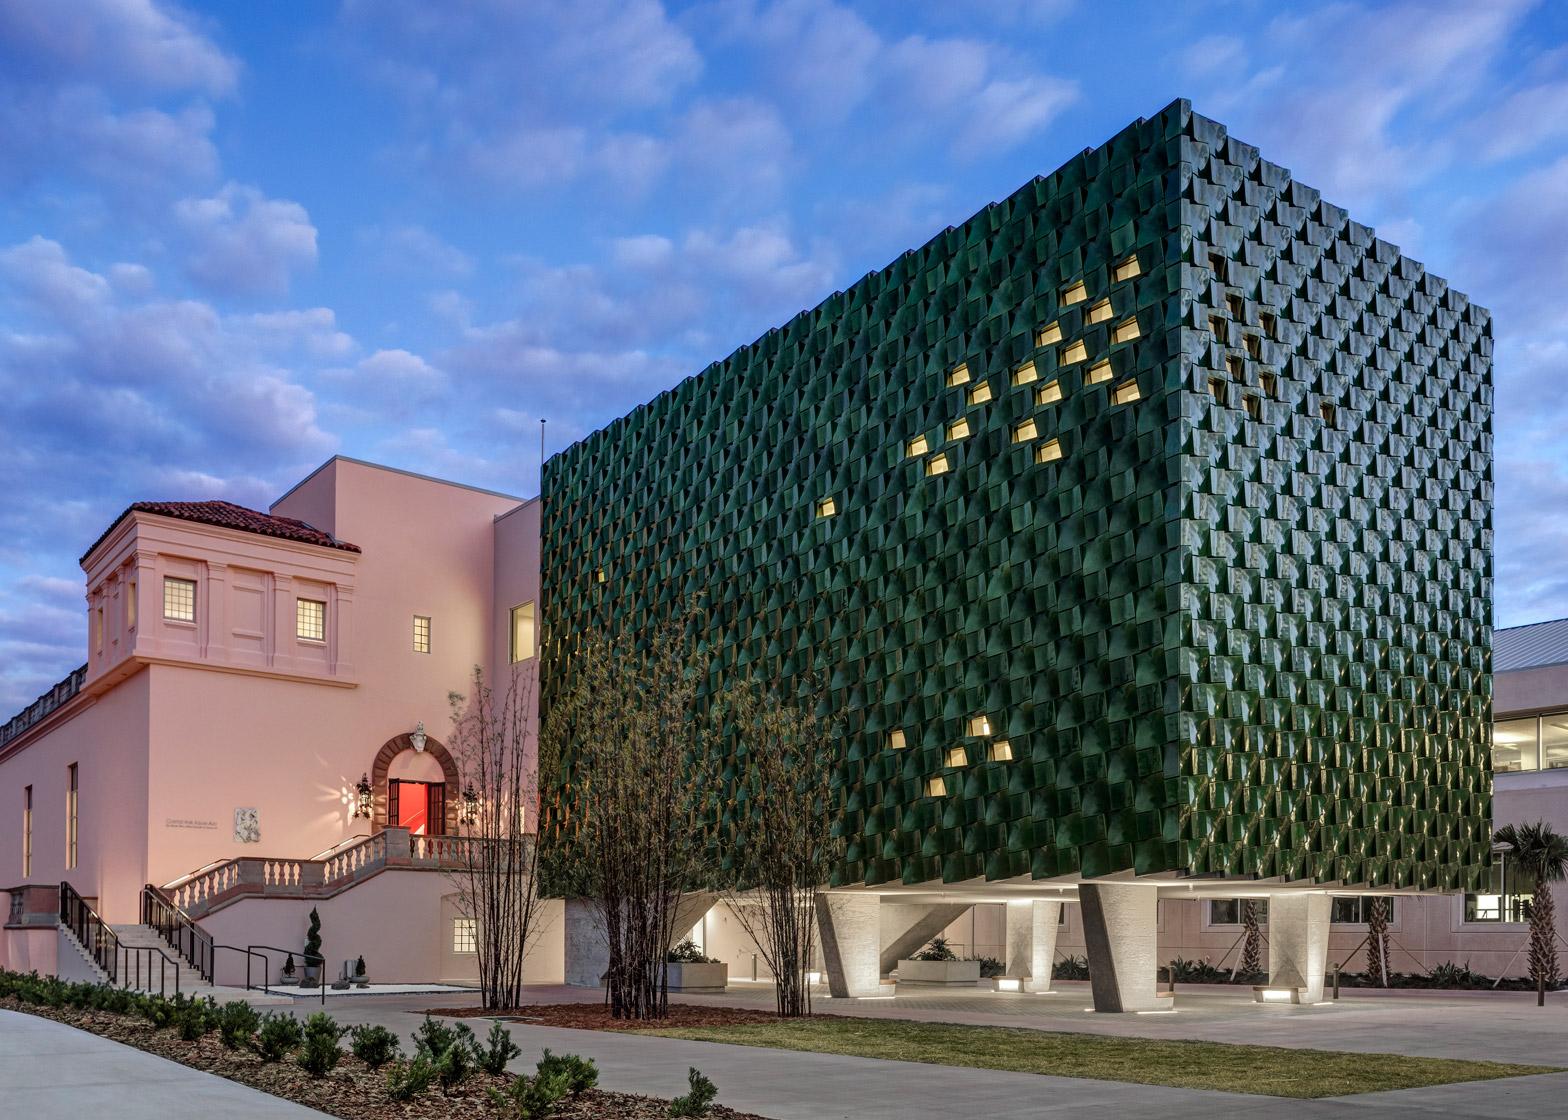 Machado Silvetti Clads Florida Museum Addition In Green Tiles